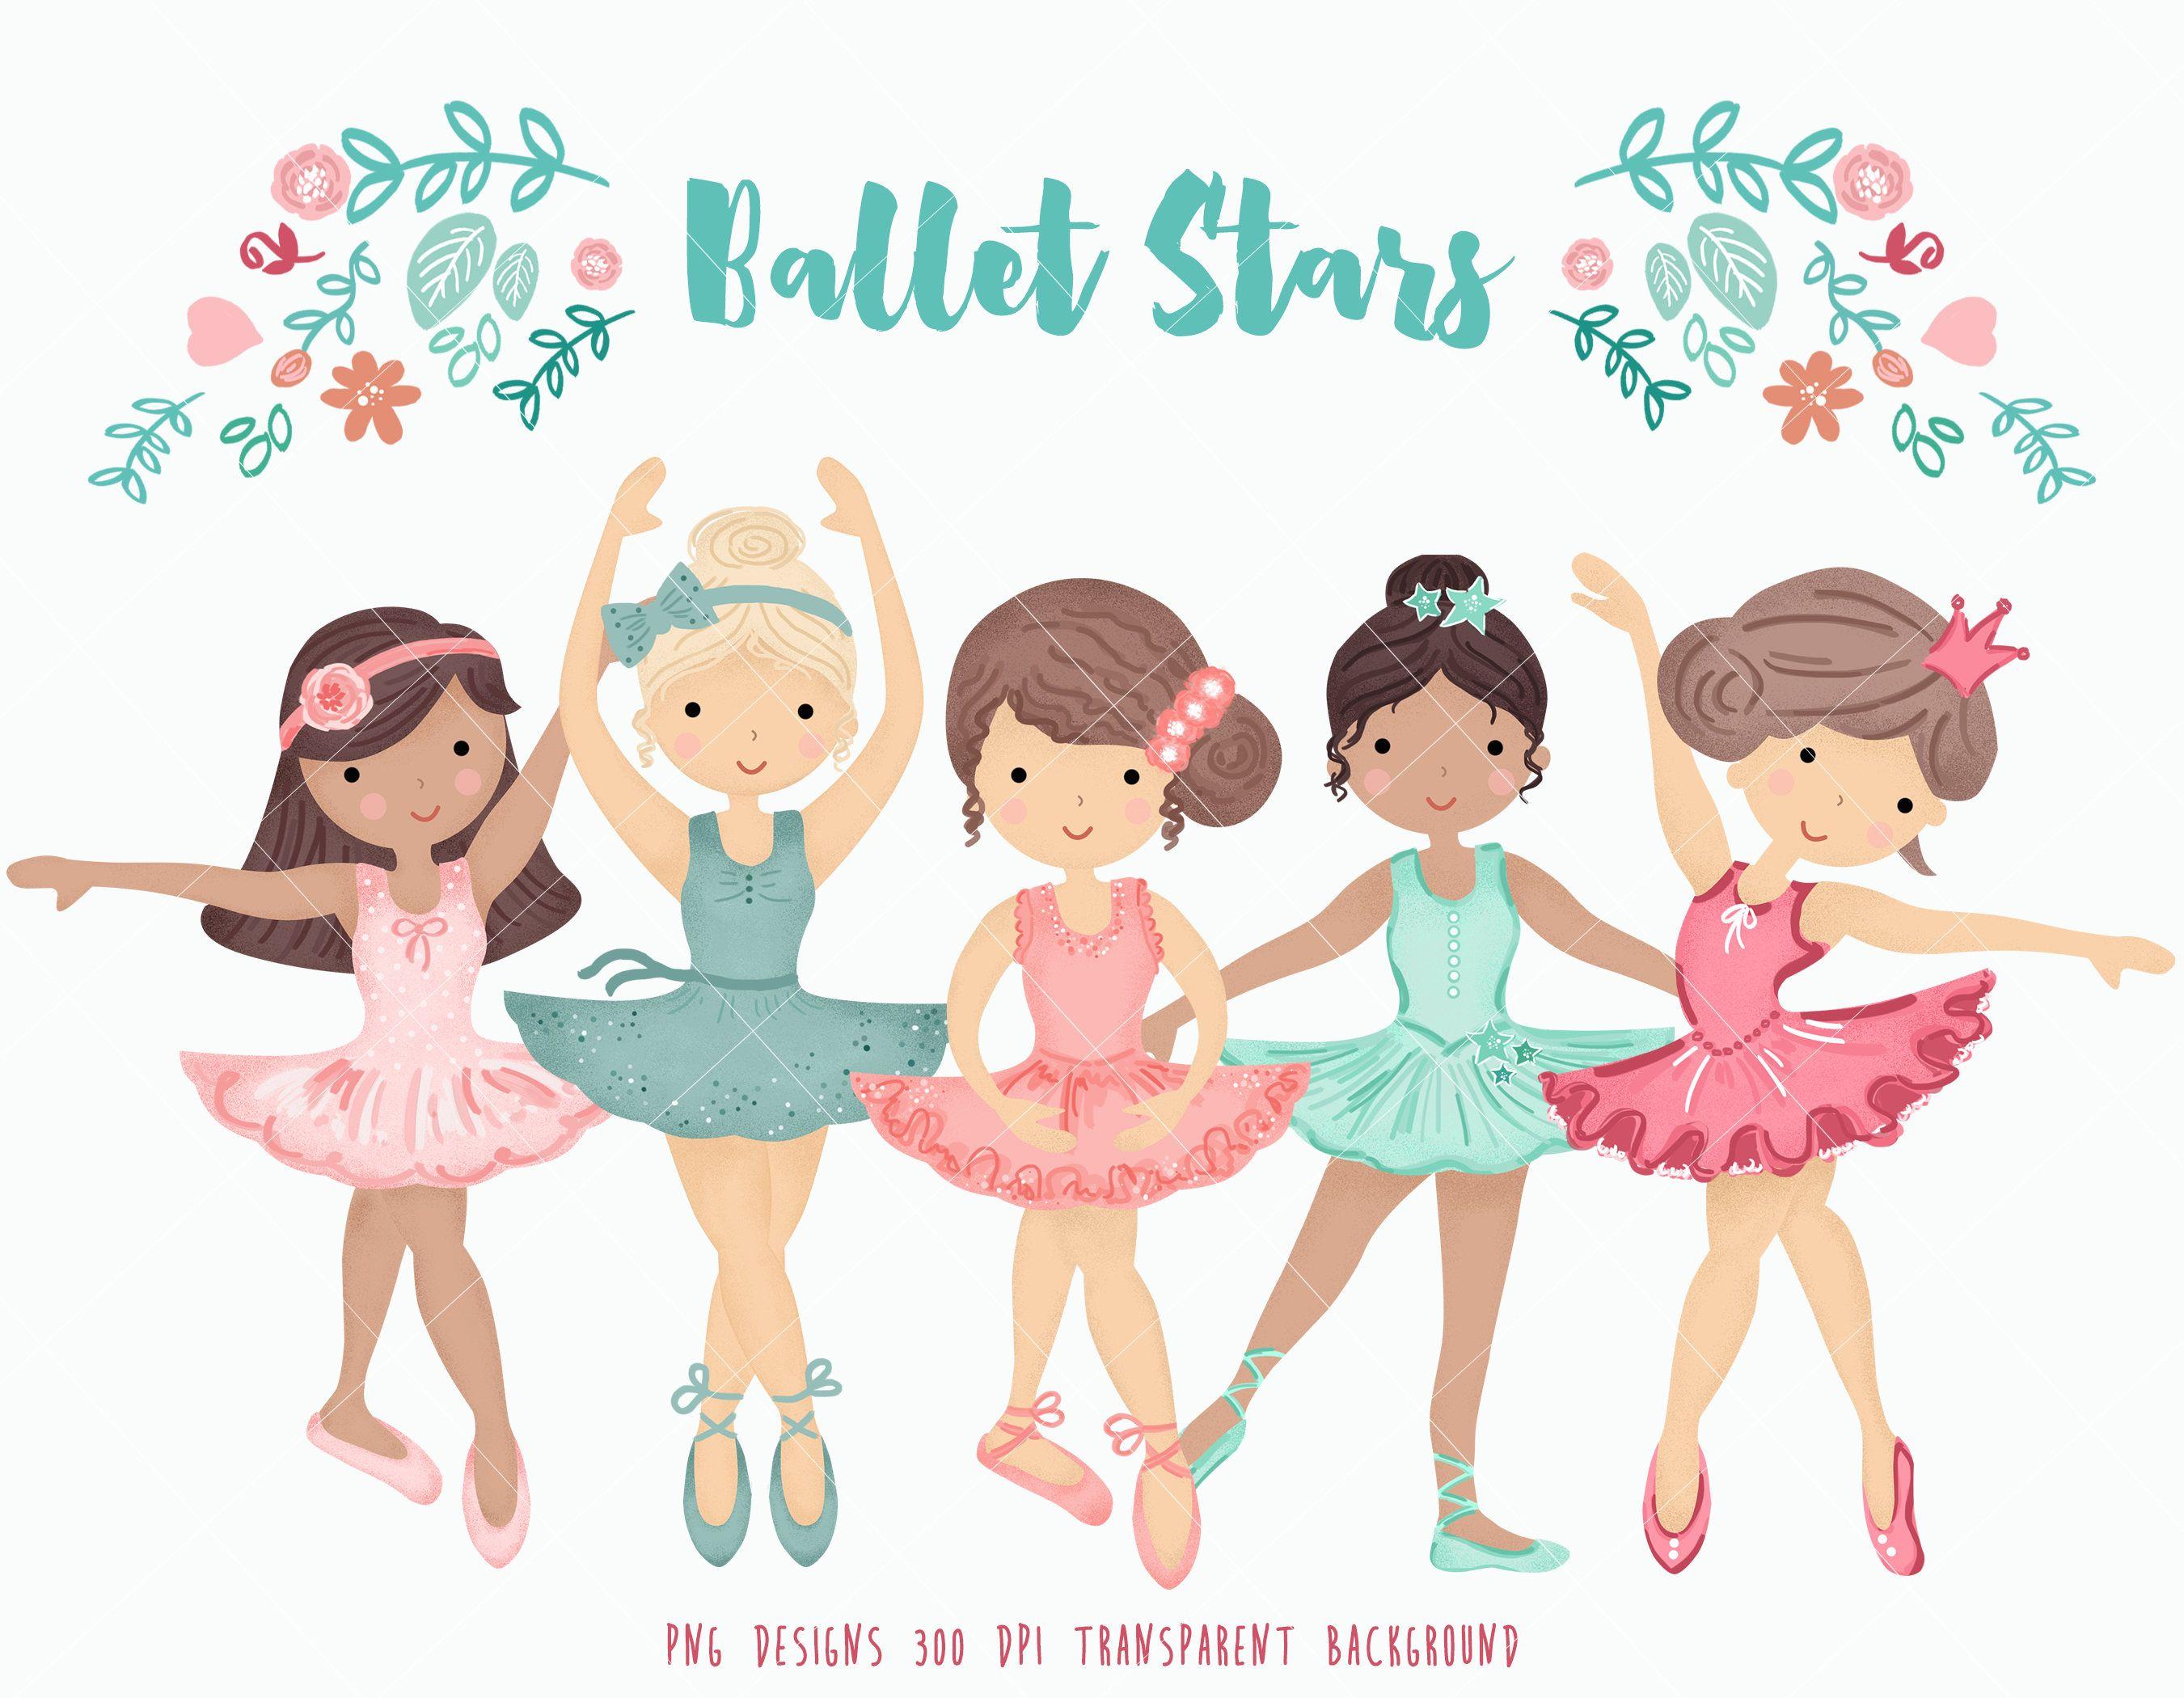 hight resolution of ballerina clipart little ballerinas clip art ballet graphic dancing girl ballet illustration prima ballerina dancer hand drawn art